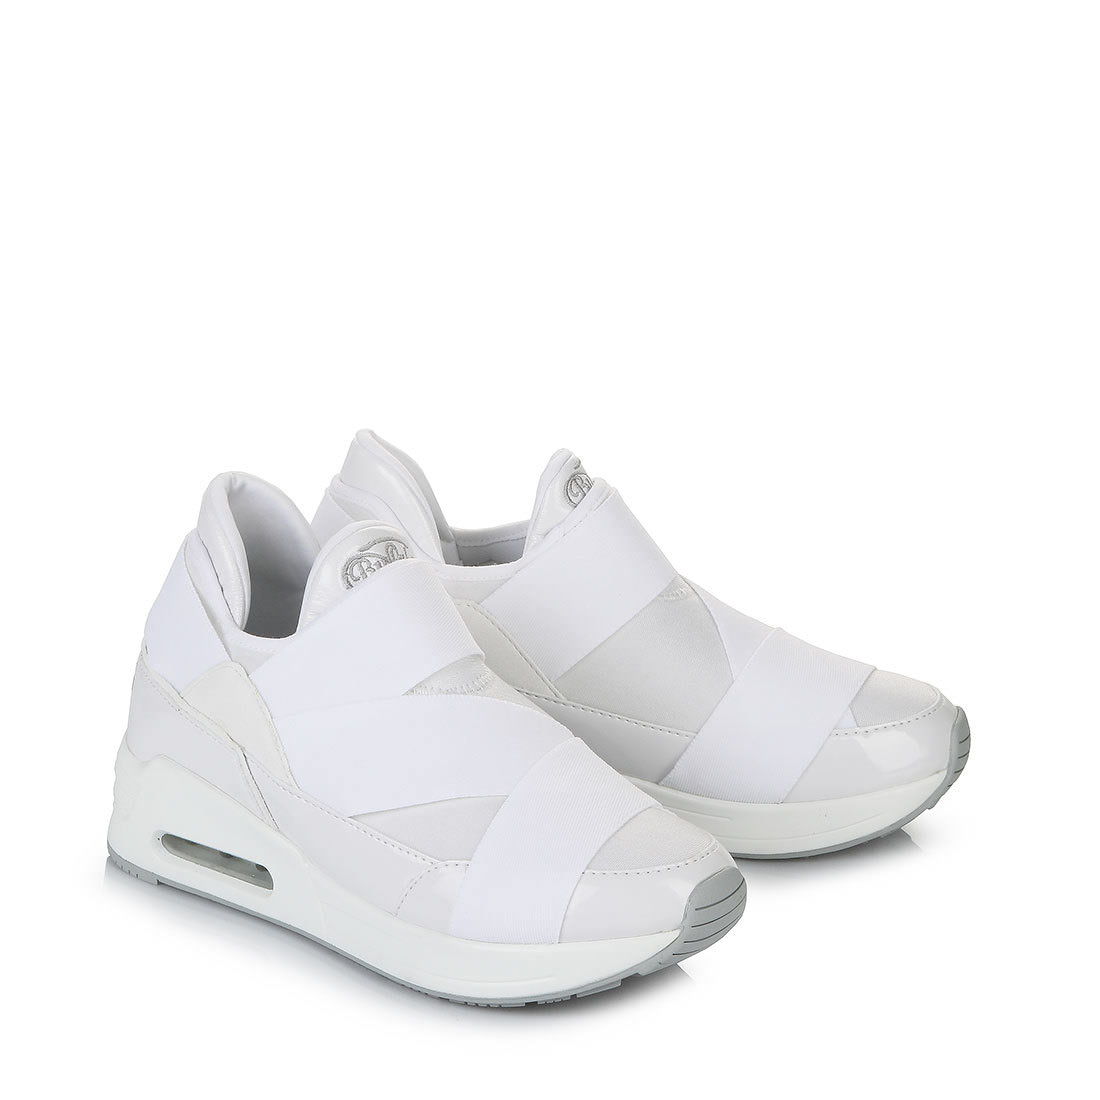 Dame 100-30 Néoprène Buffle Sneaker En Daim wyLebO